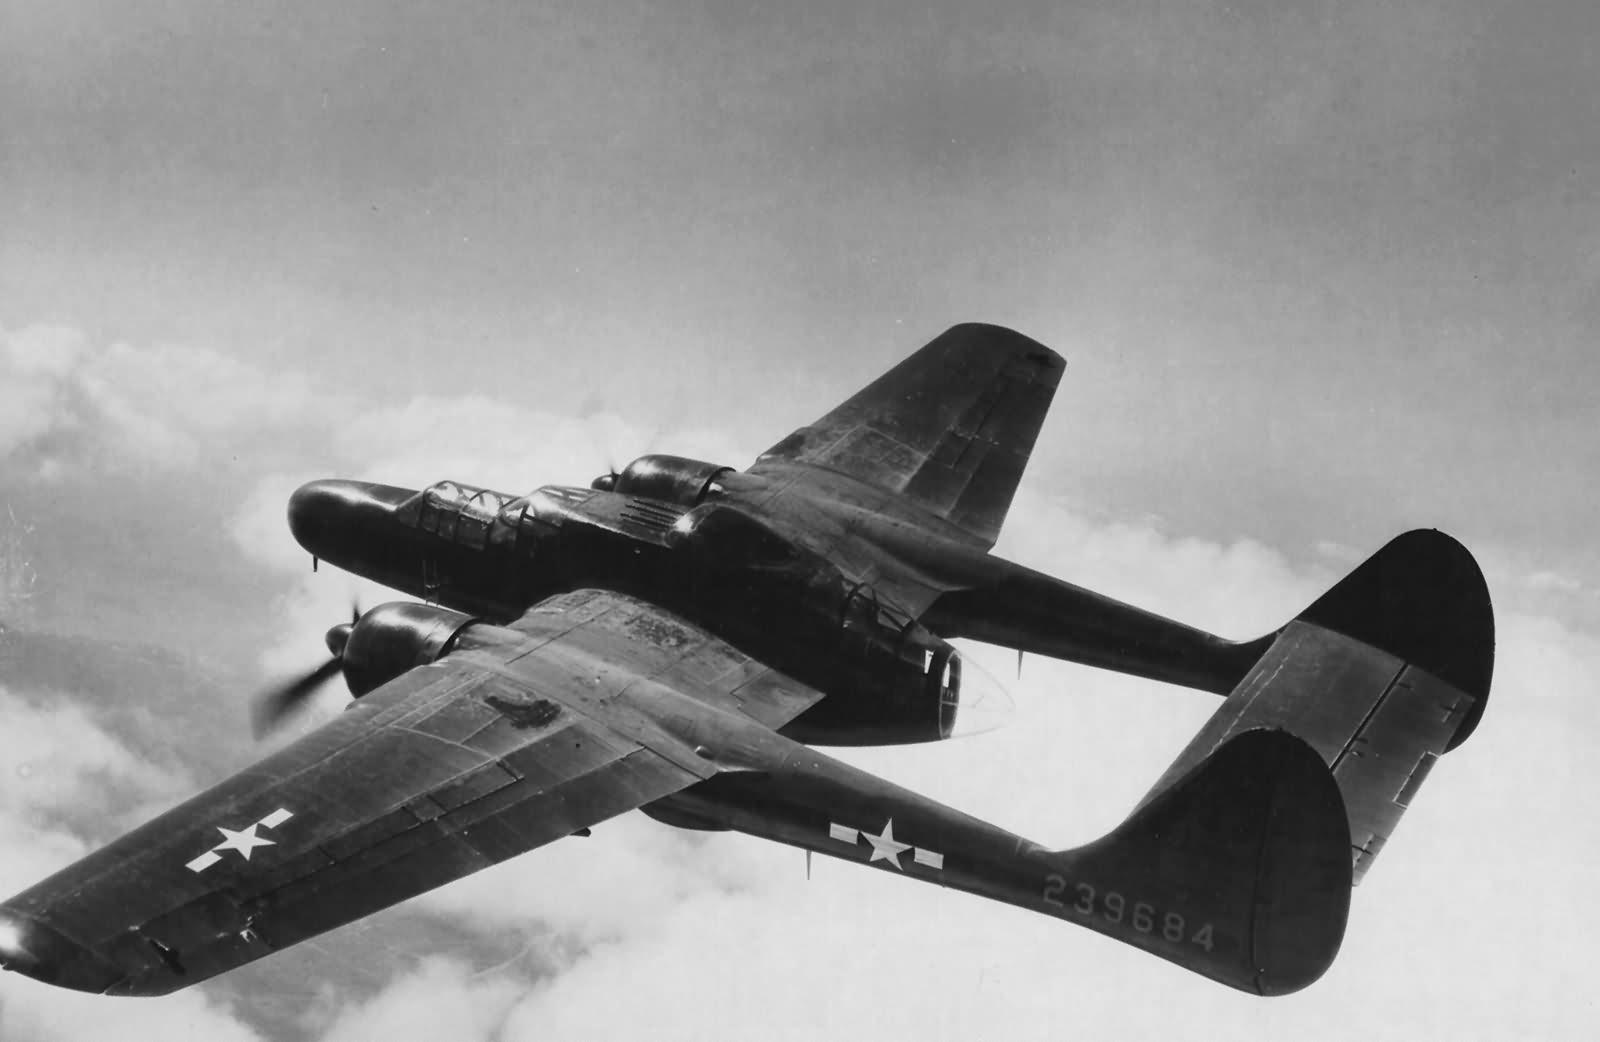 P-61_Black_Widow_42-39684_of_the_416th_N